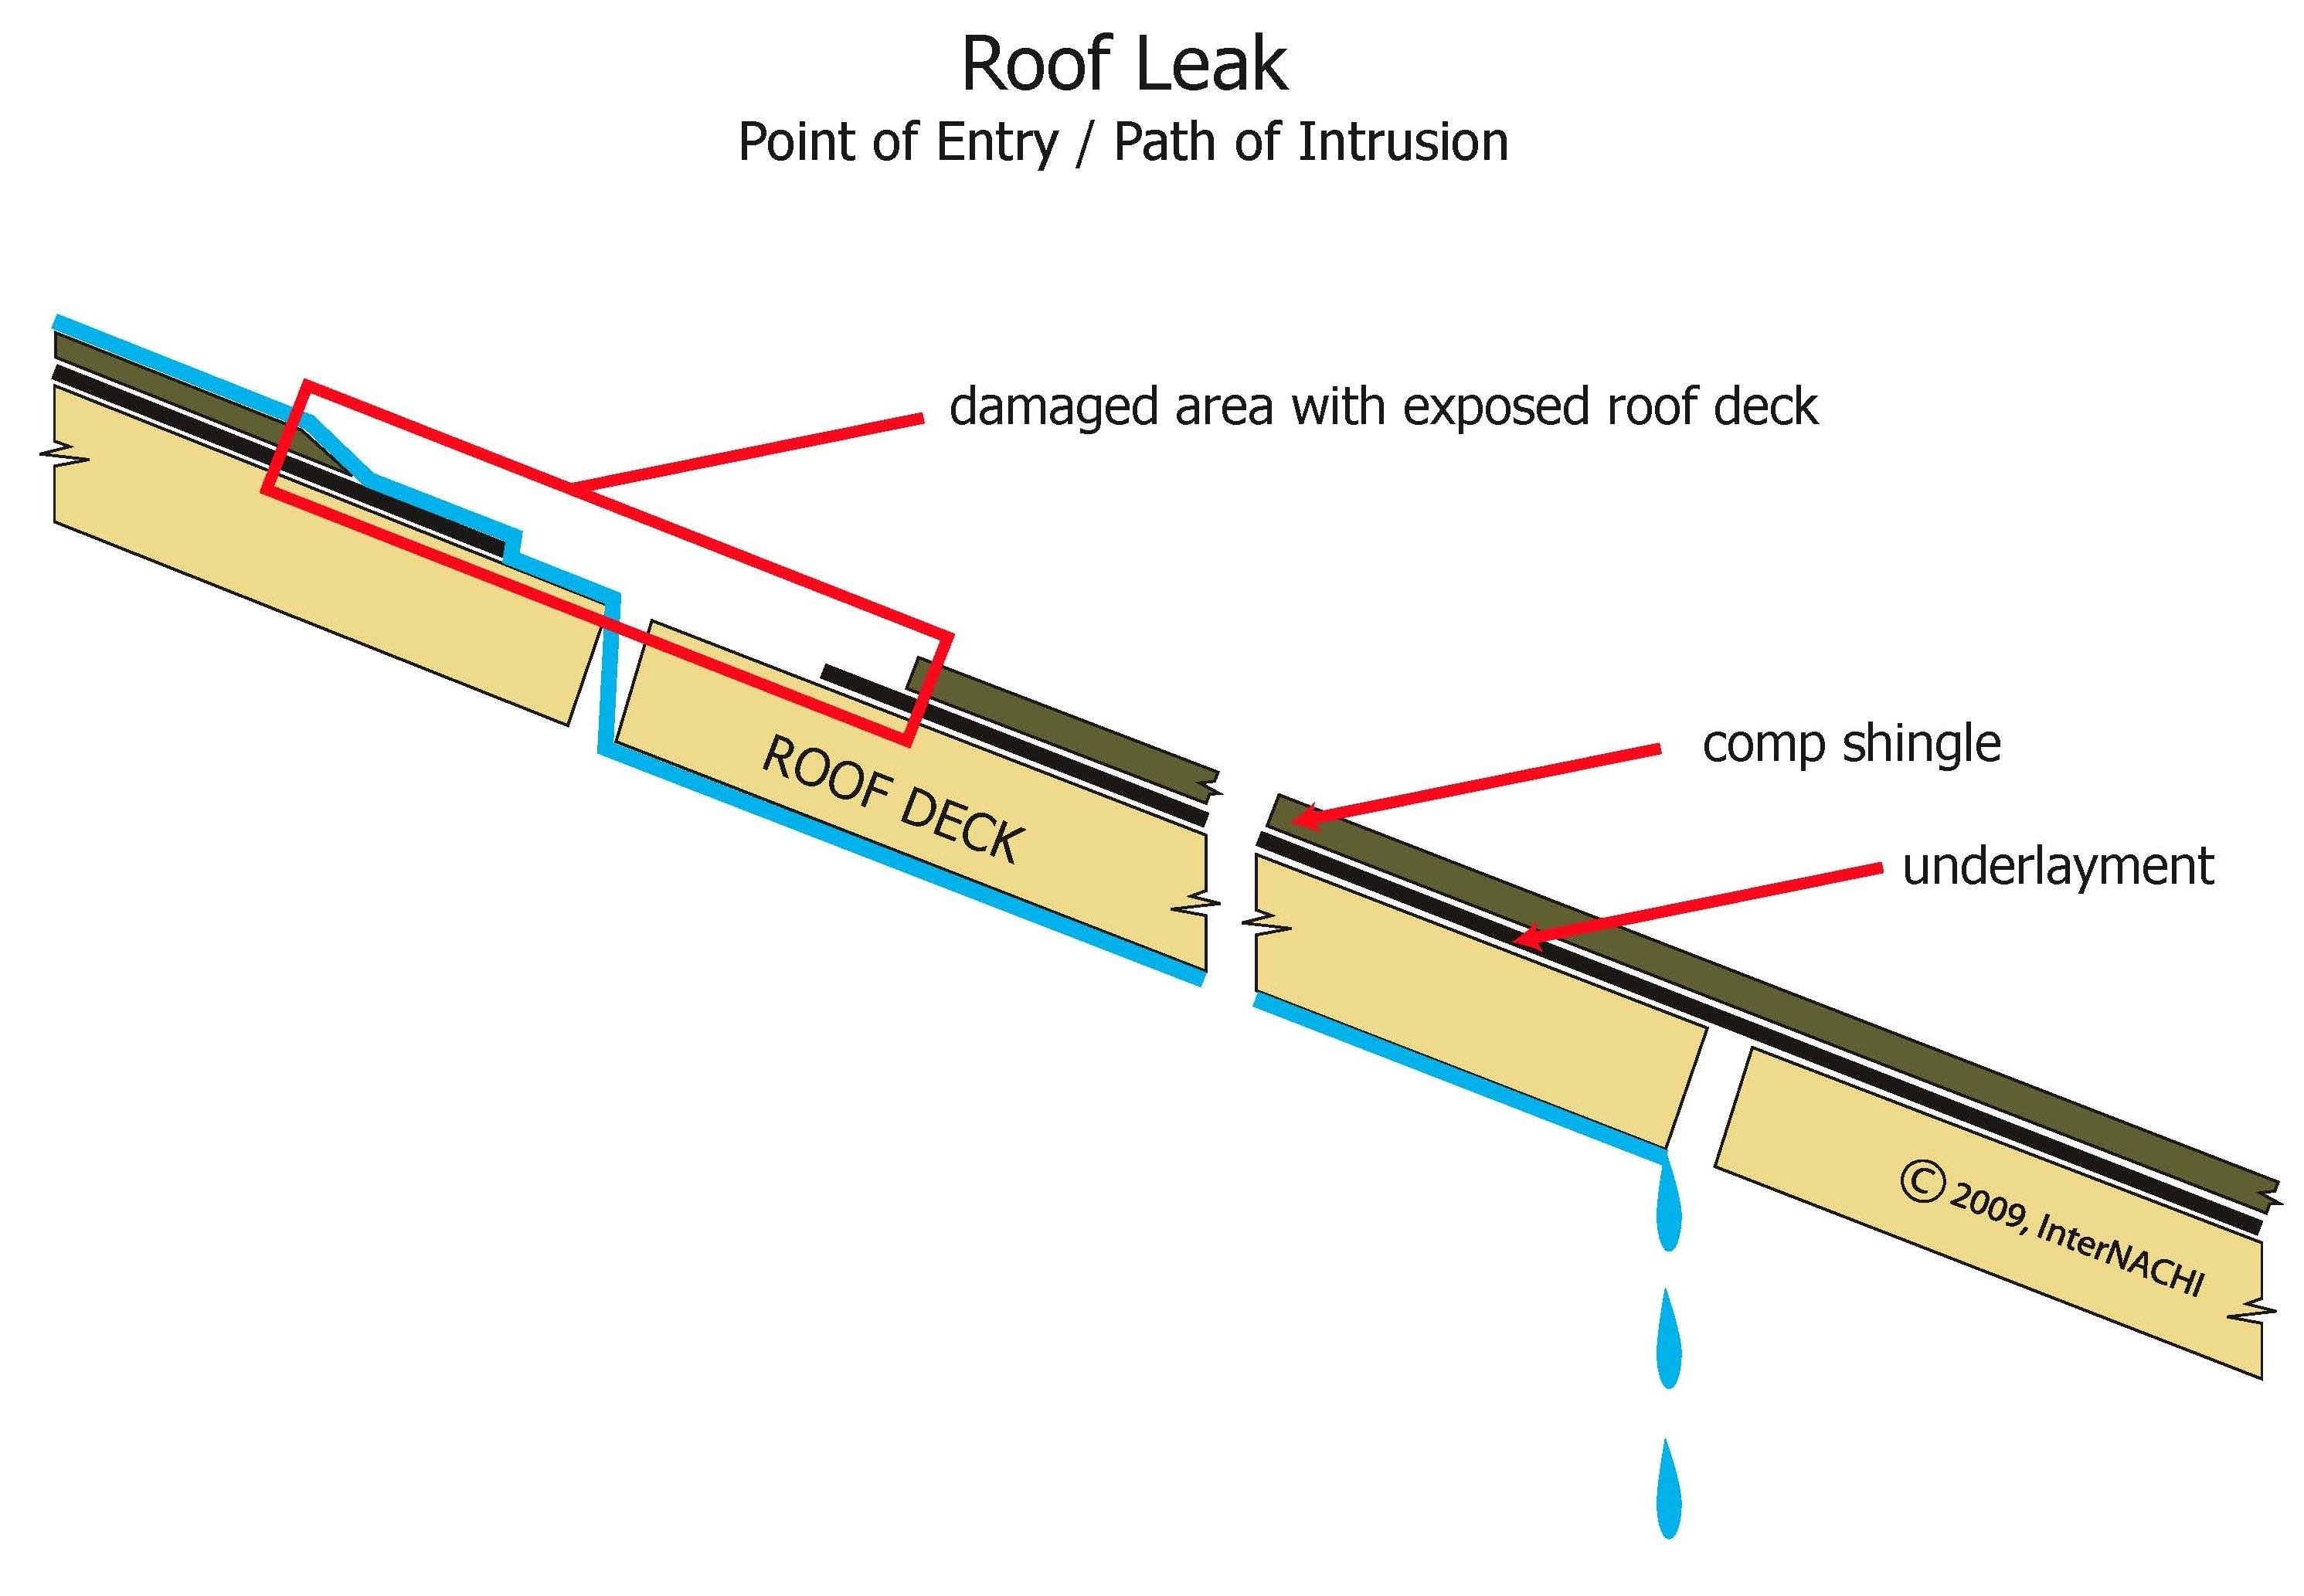 Roof leak path of intrusion.